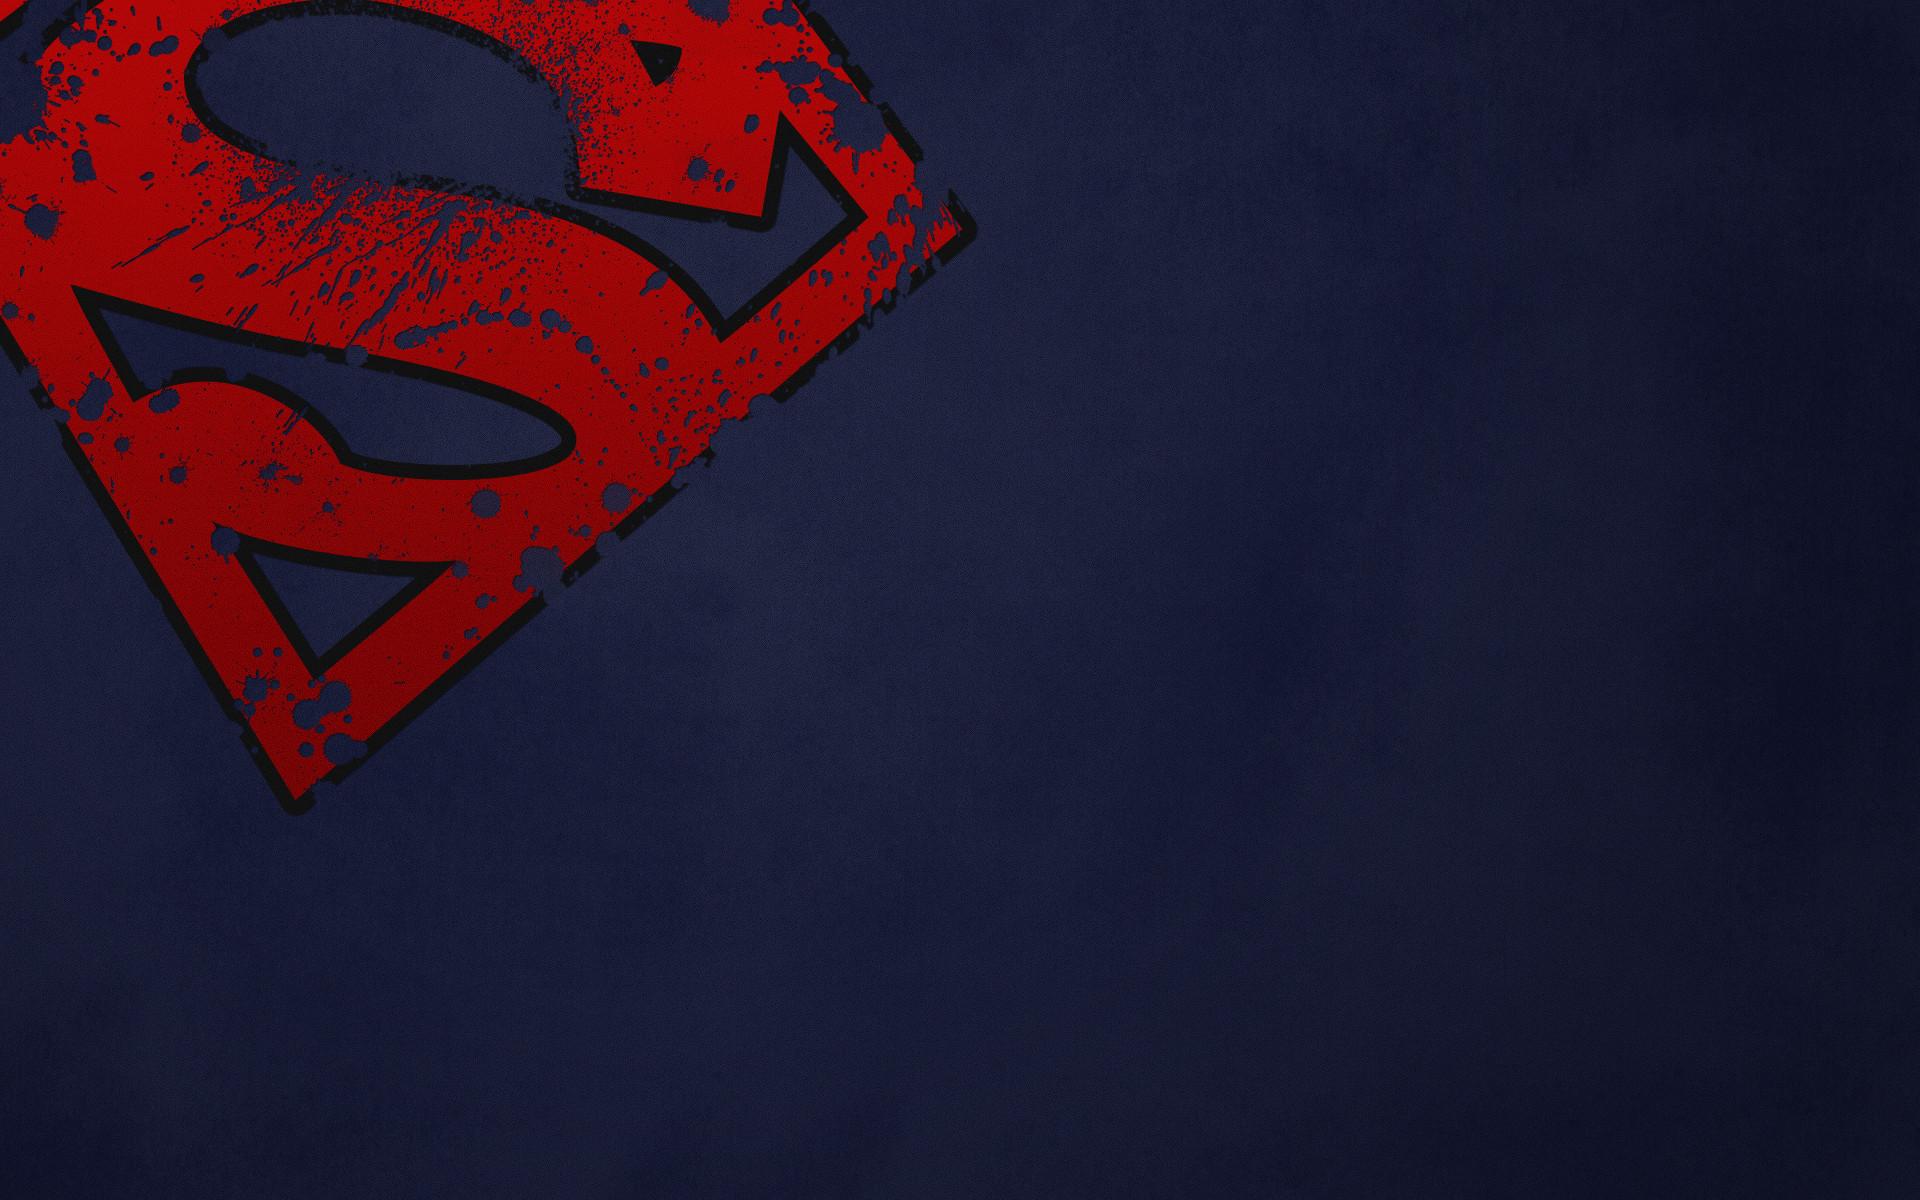 Dc Comics Logo Wallpaper High Quality As Wallpaper HD